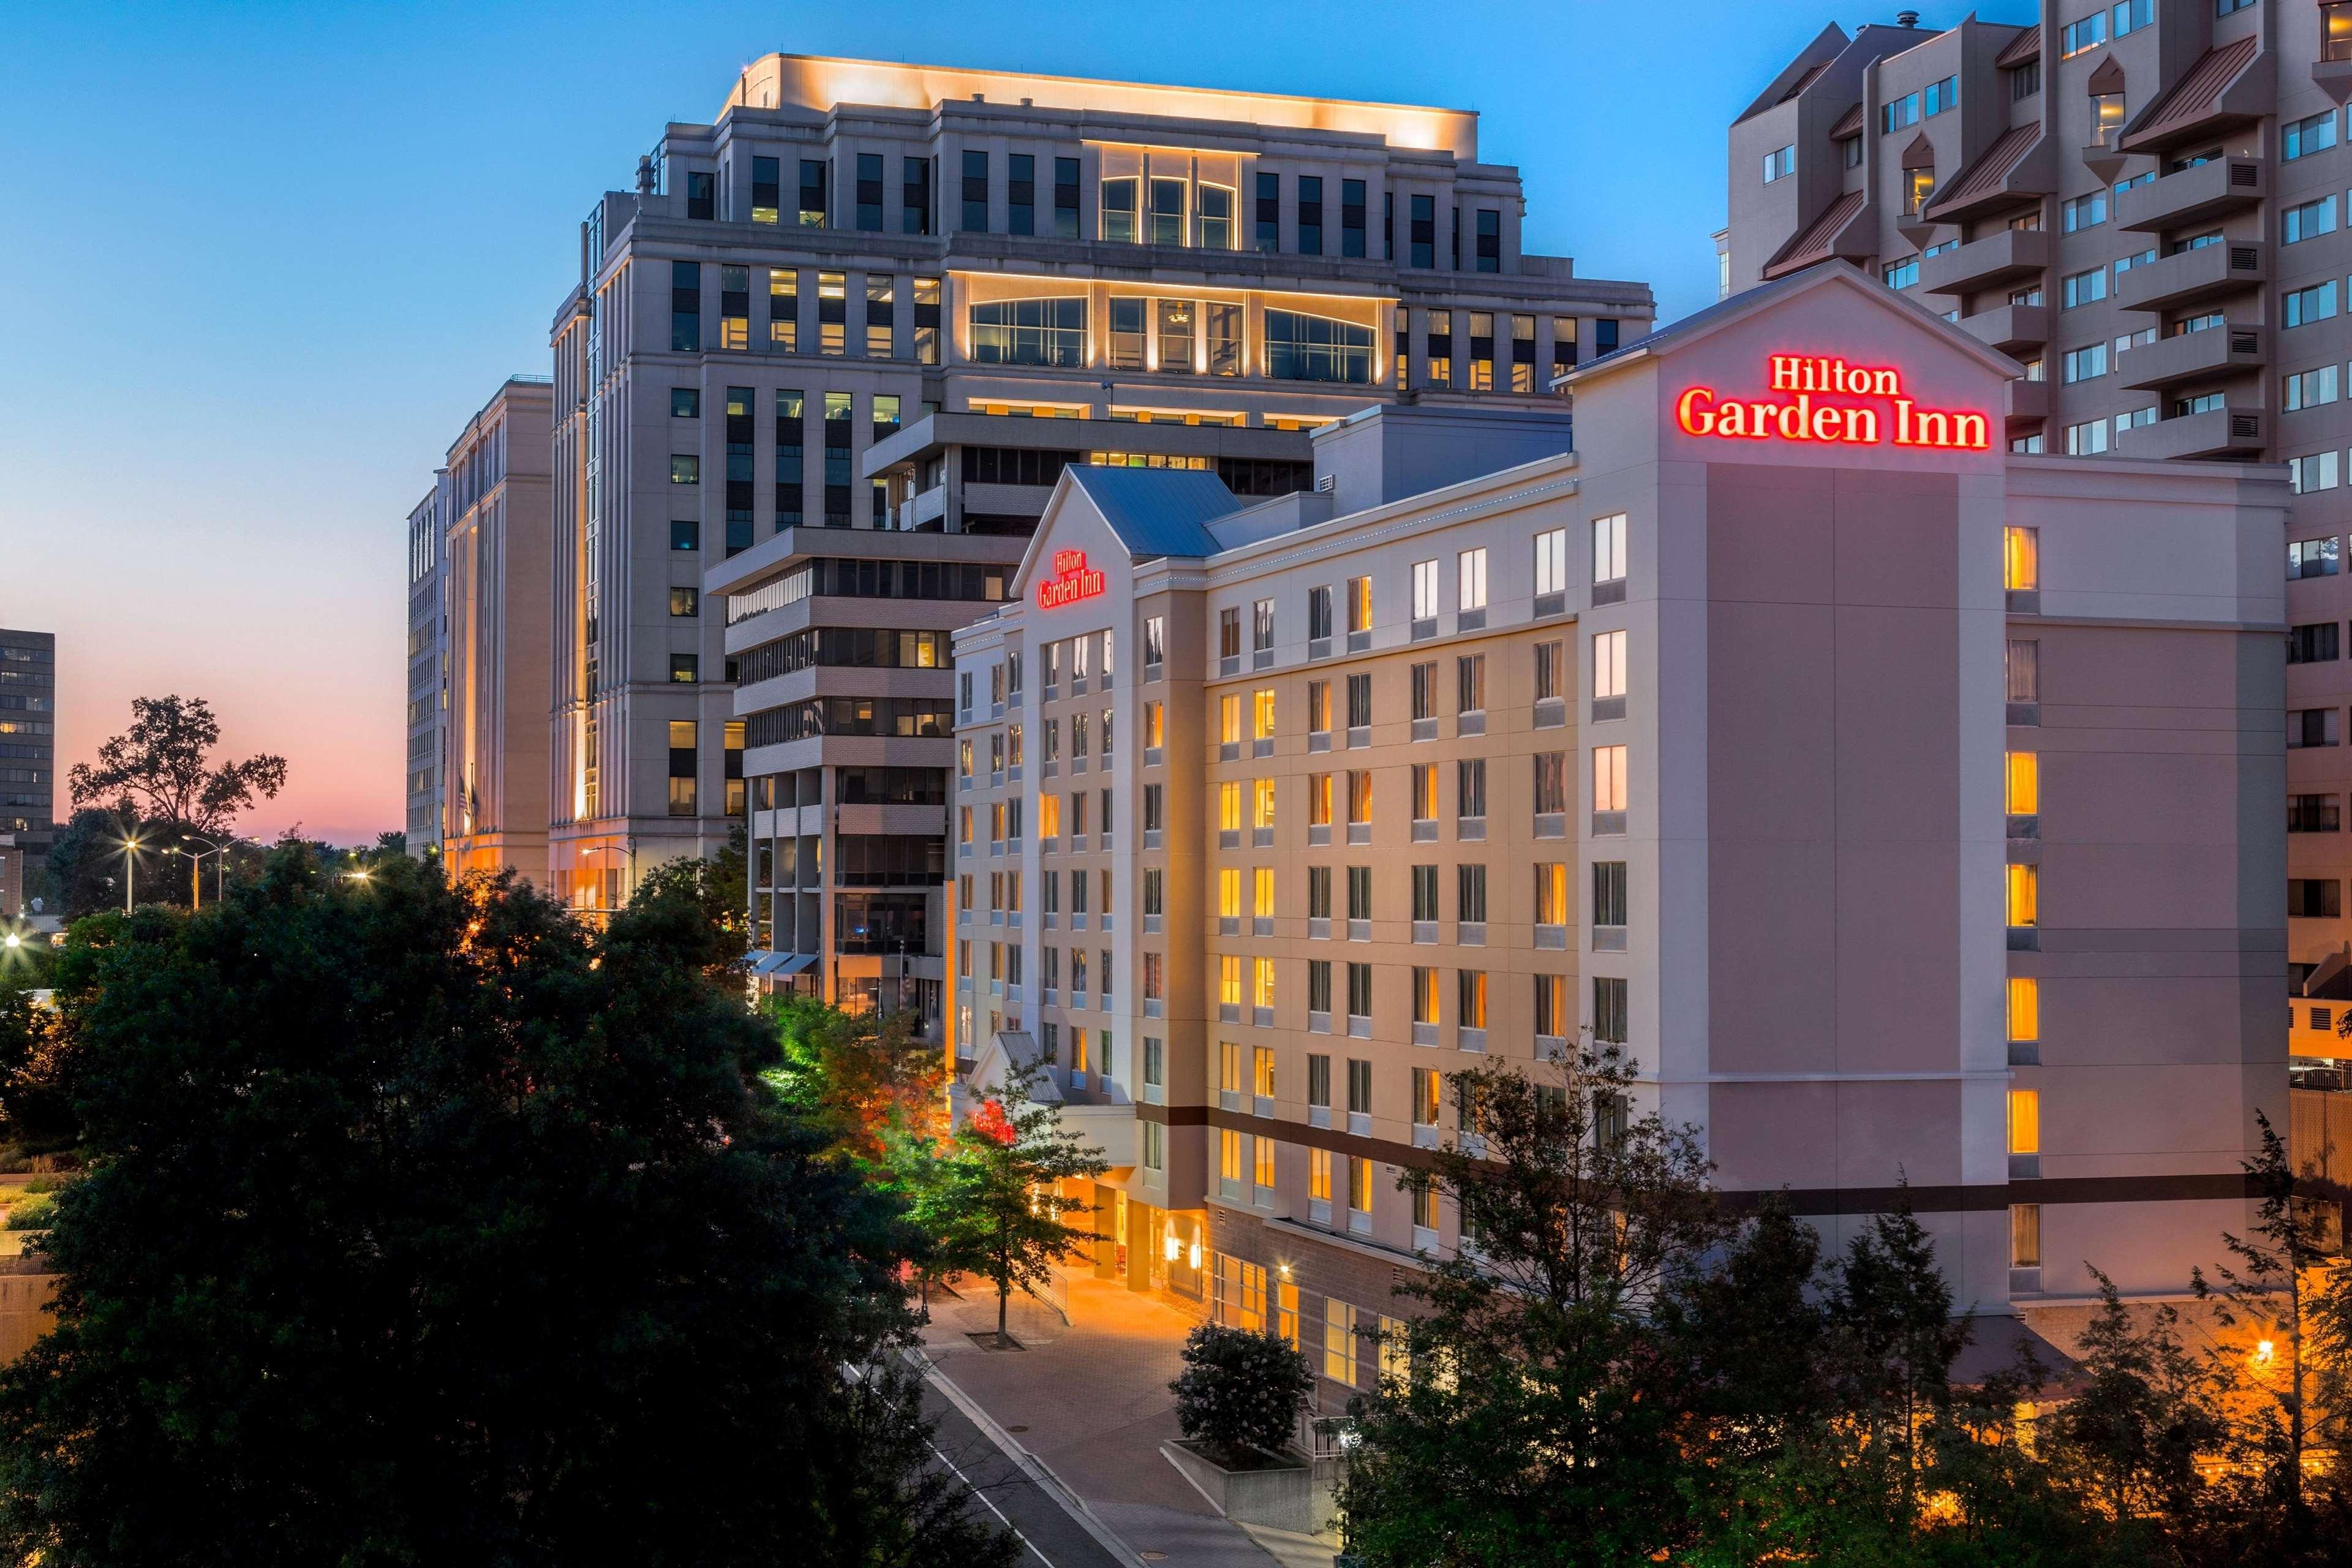 Hilton Garden Inn Arlington/Courthouse Plaza image 36